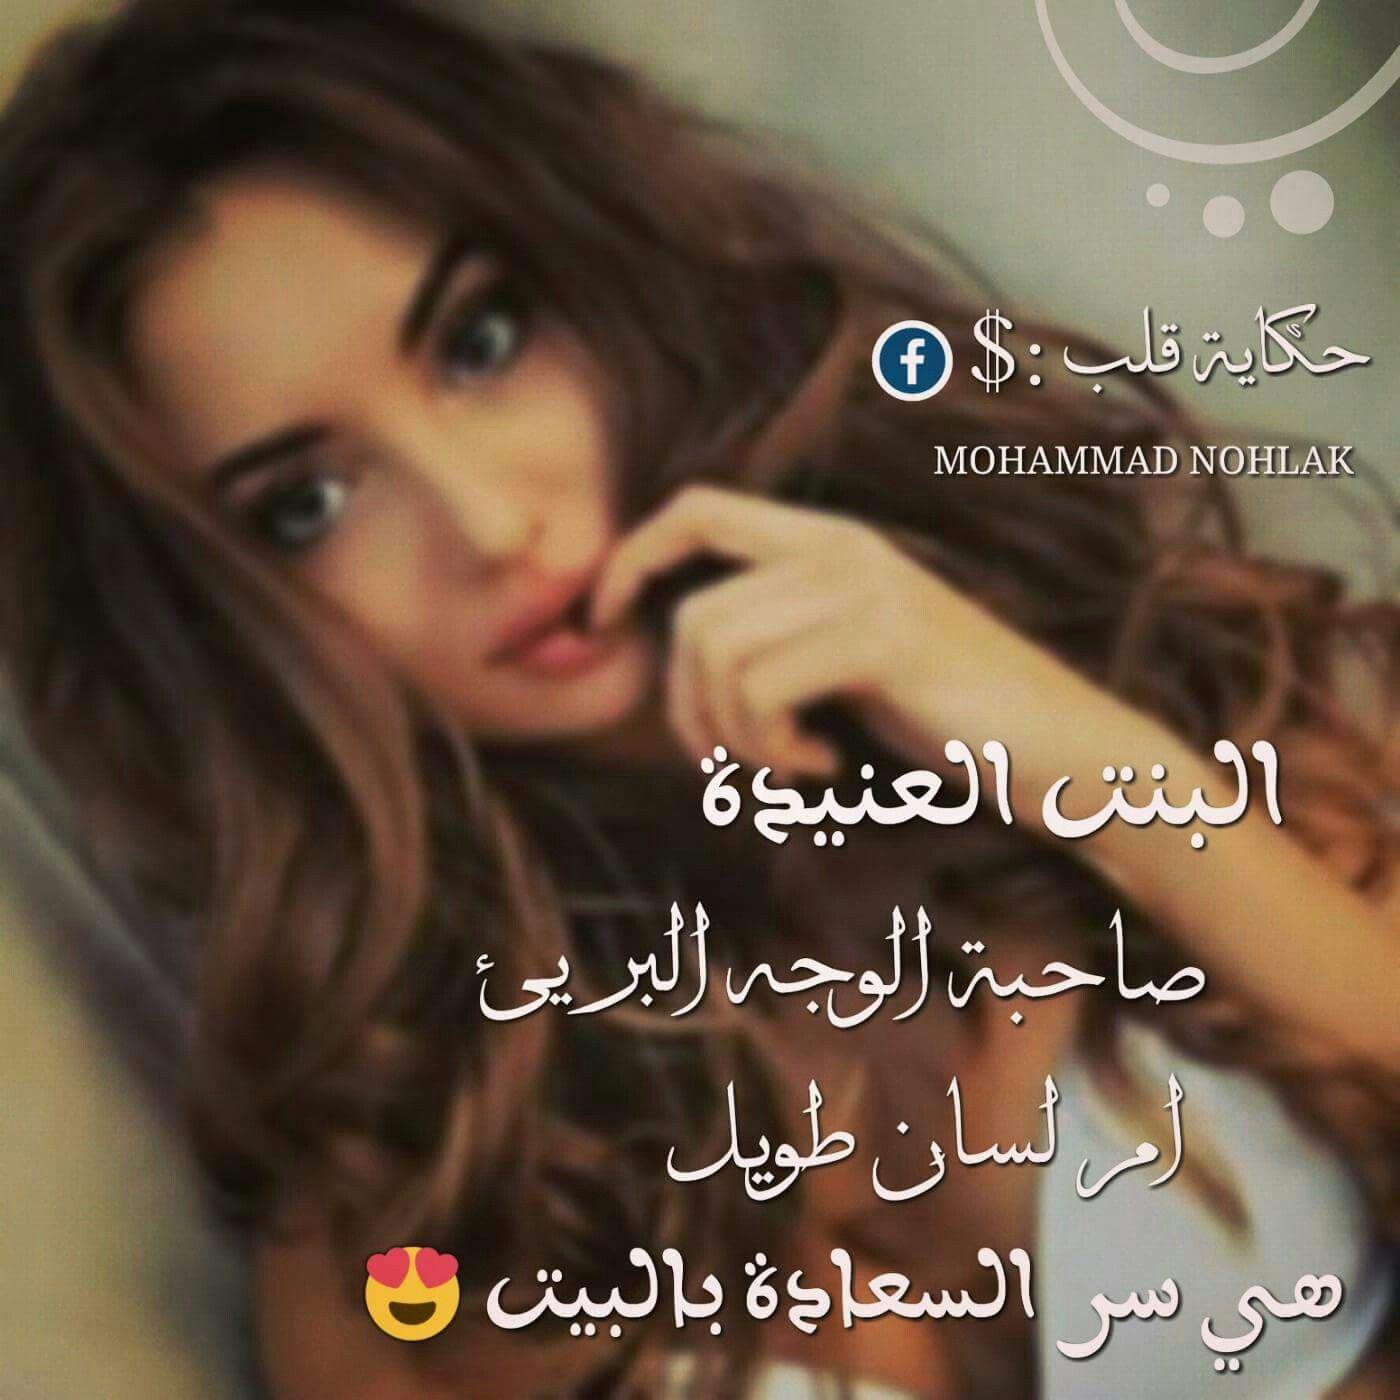 هههههــهههههه ايـรـي ايـรـي وربي فـะـ دووهہ اروحلي Beautiful Arabic Words Laughing Quotes Arabic Funny